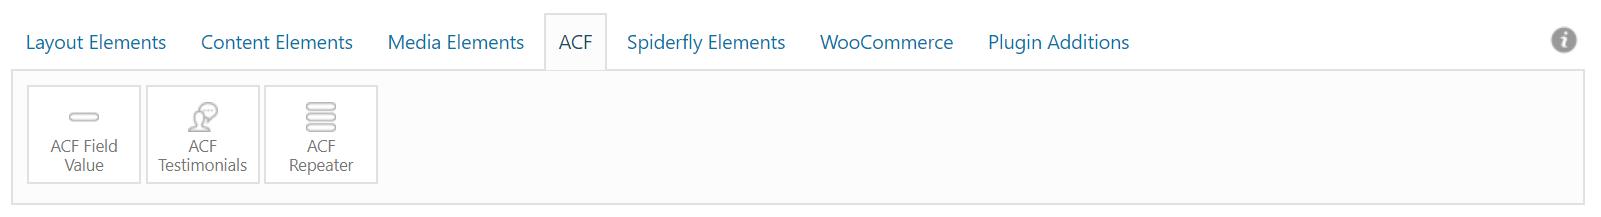 Custom Enfold Layout Elements - ACF